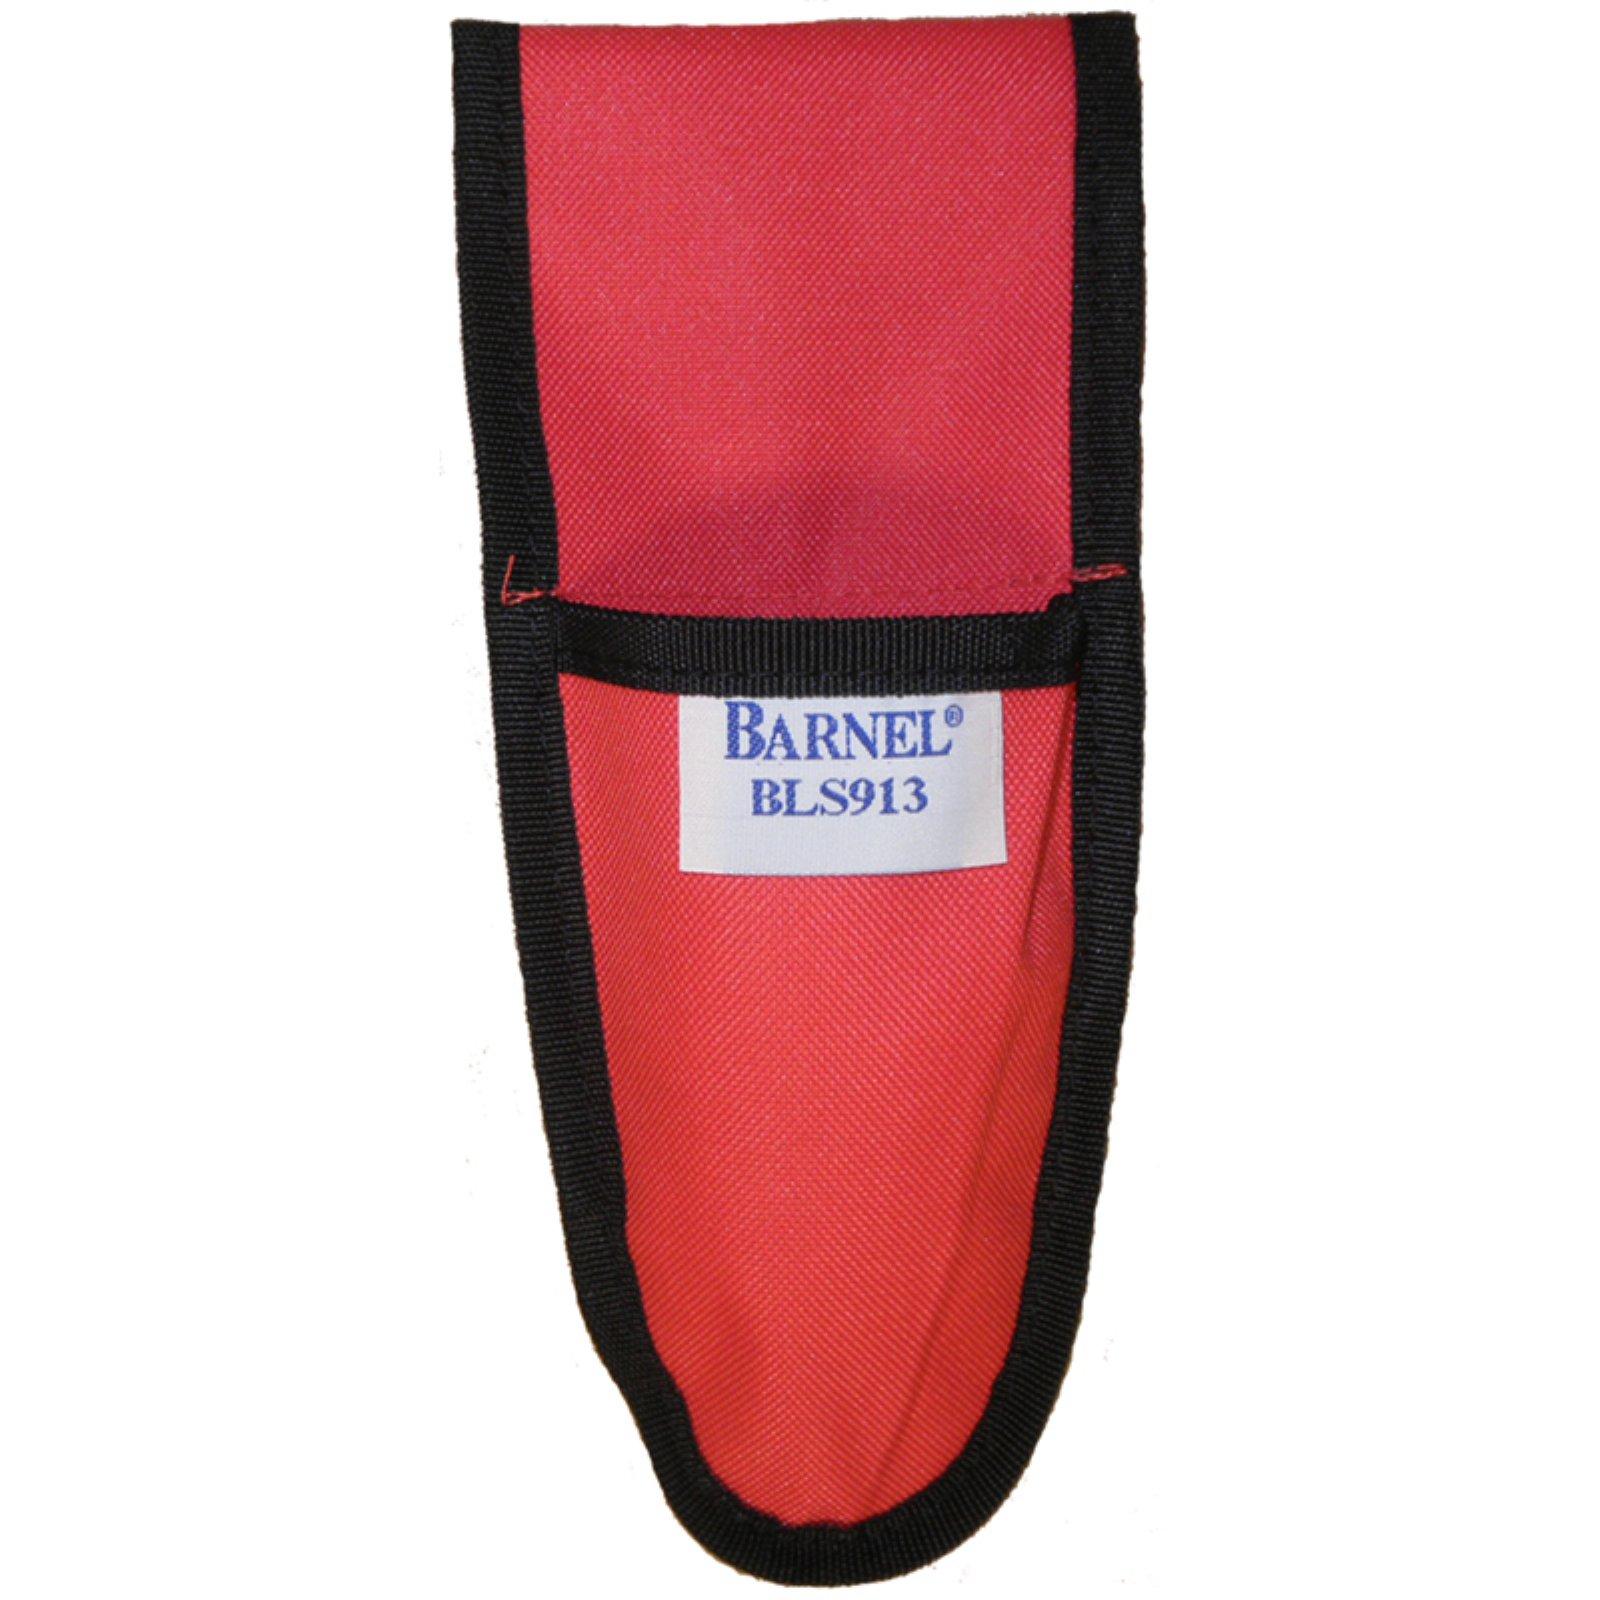 Barnel International BLS913 Nylon Sheath